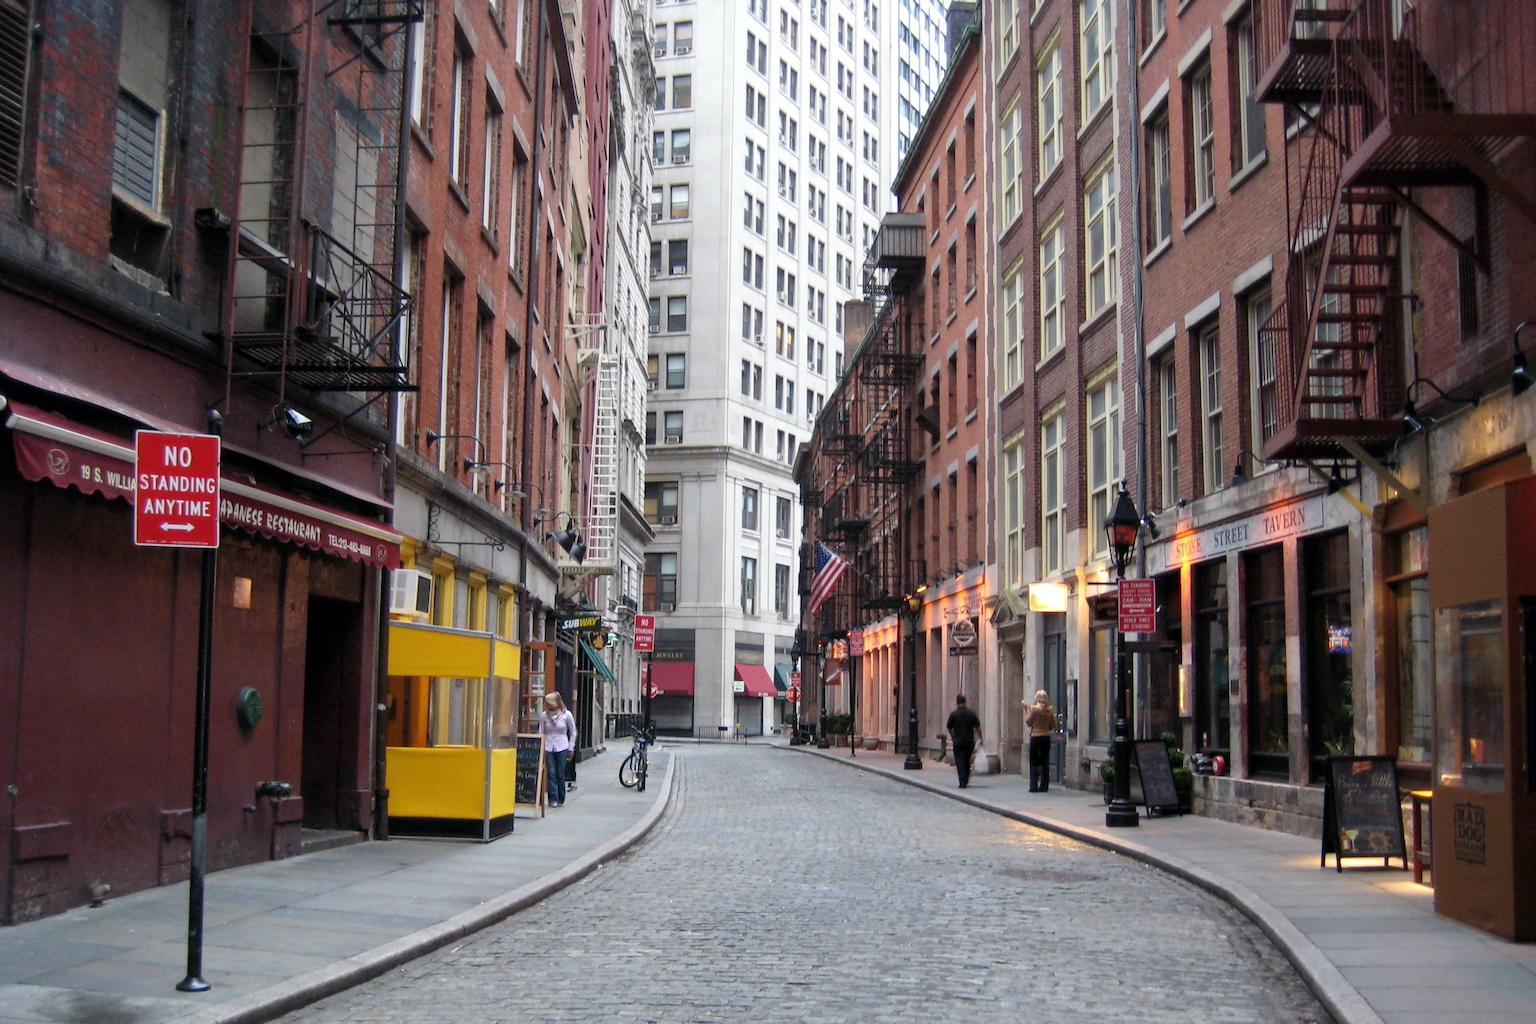 A photo of a city street